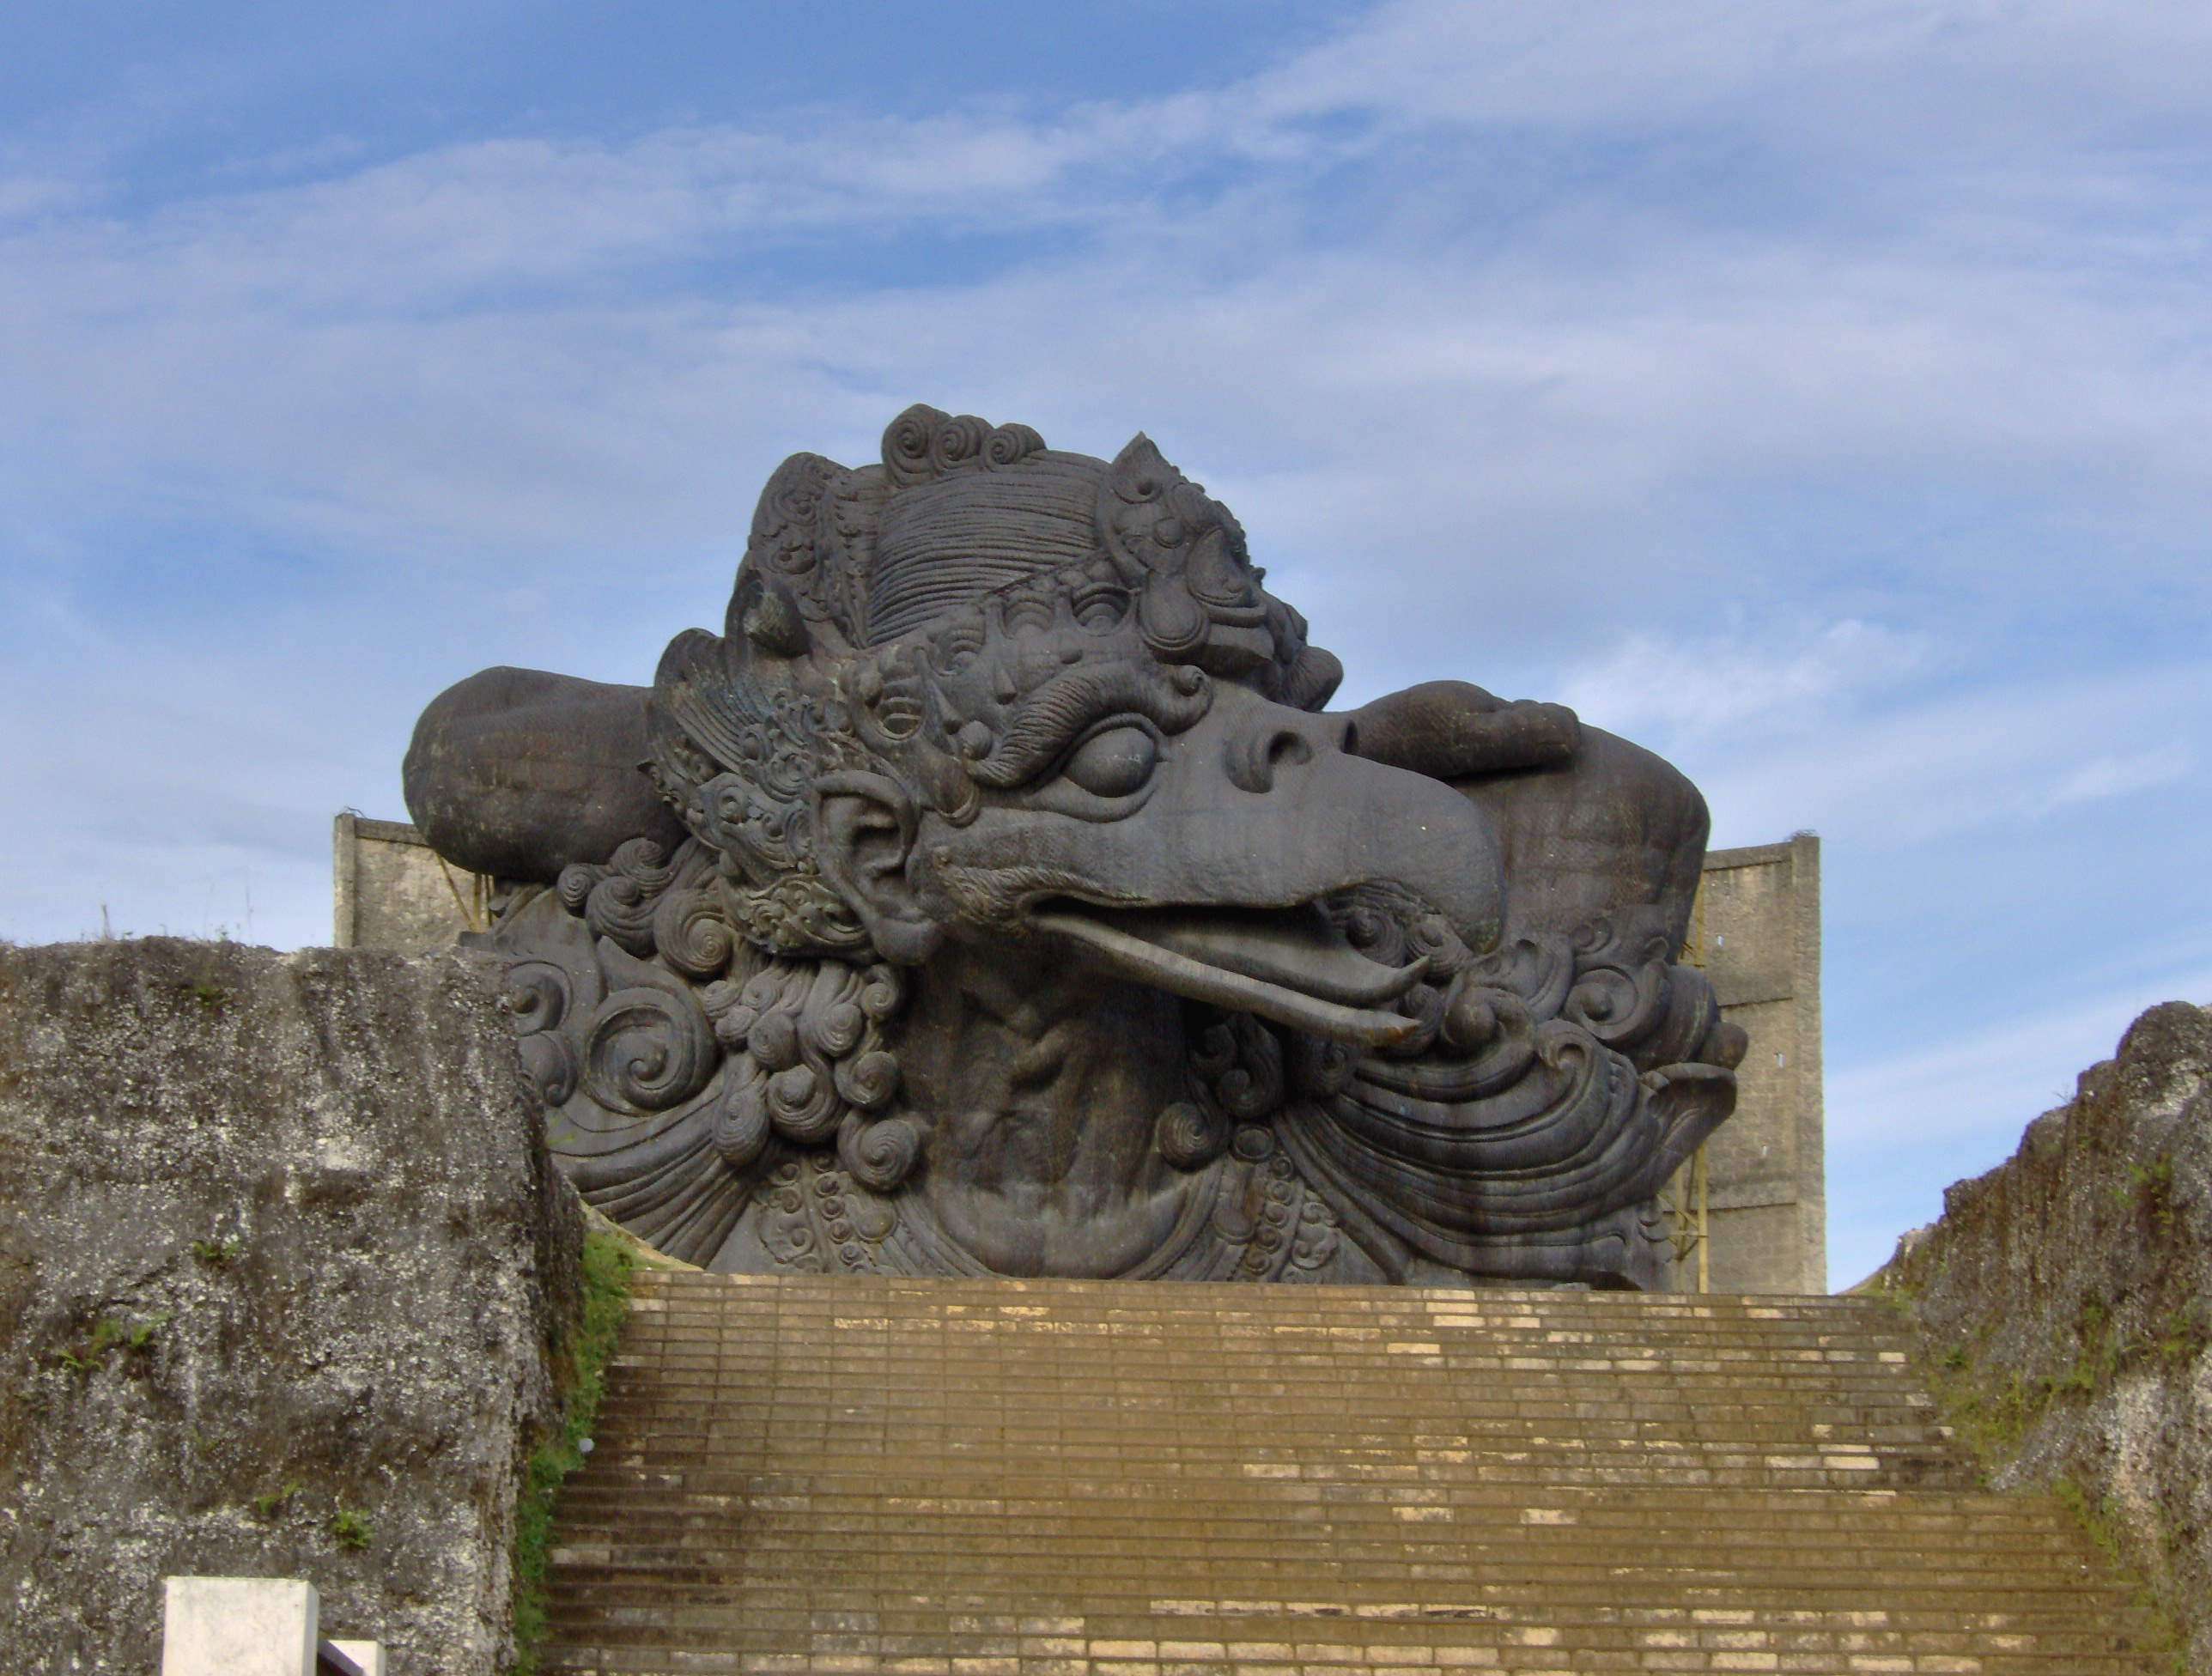 The Mythical Bird Garuda As The Lord Vishnus Mount Garuda Wisnu Kencana